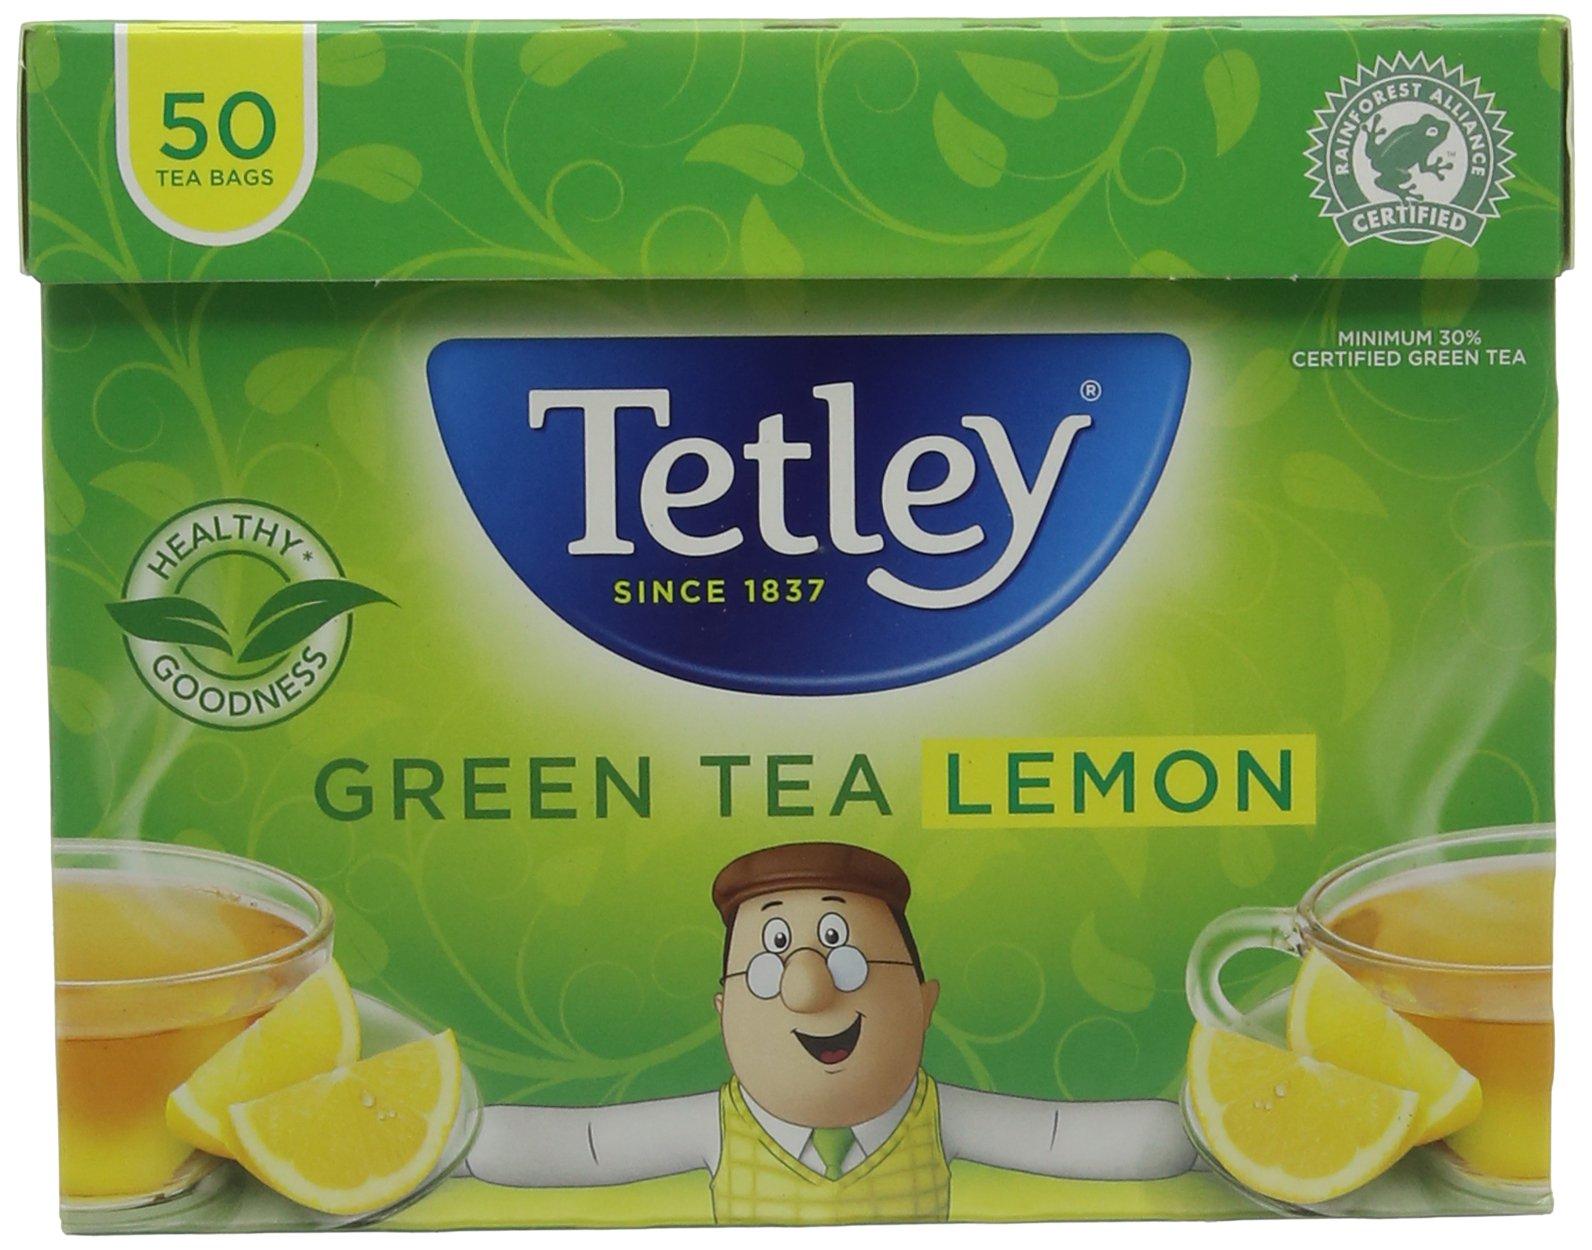 Tetley green tea bundle (rainforest alliance) (green tea) (6 packs of 50 bags) (300 bags) (a fruity tea with aromas of lemon) (brews in 1-3 minutes)